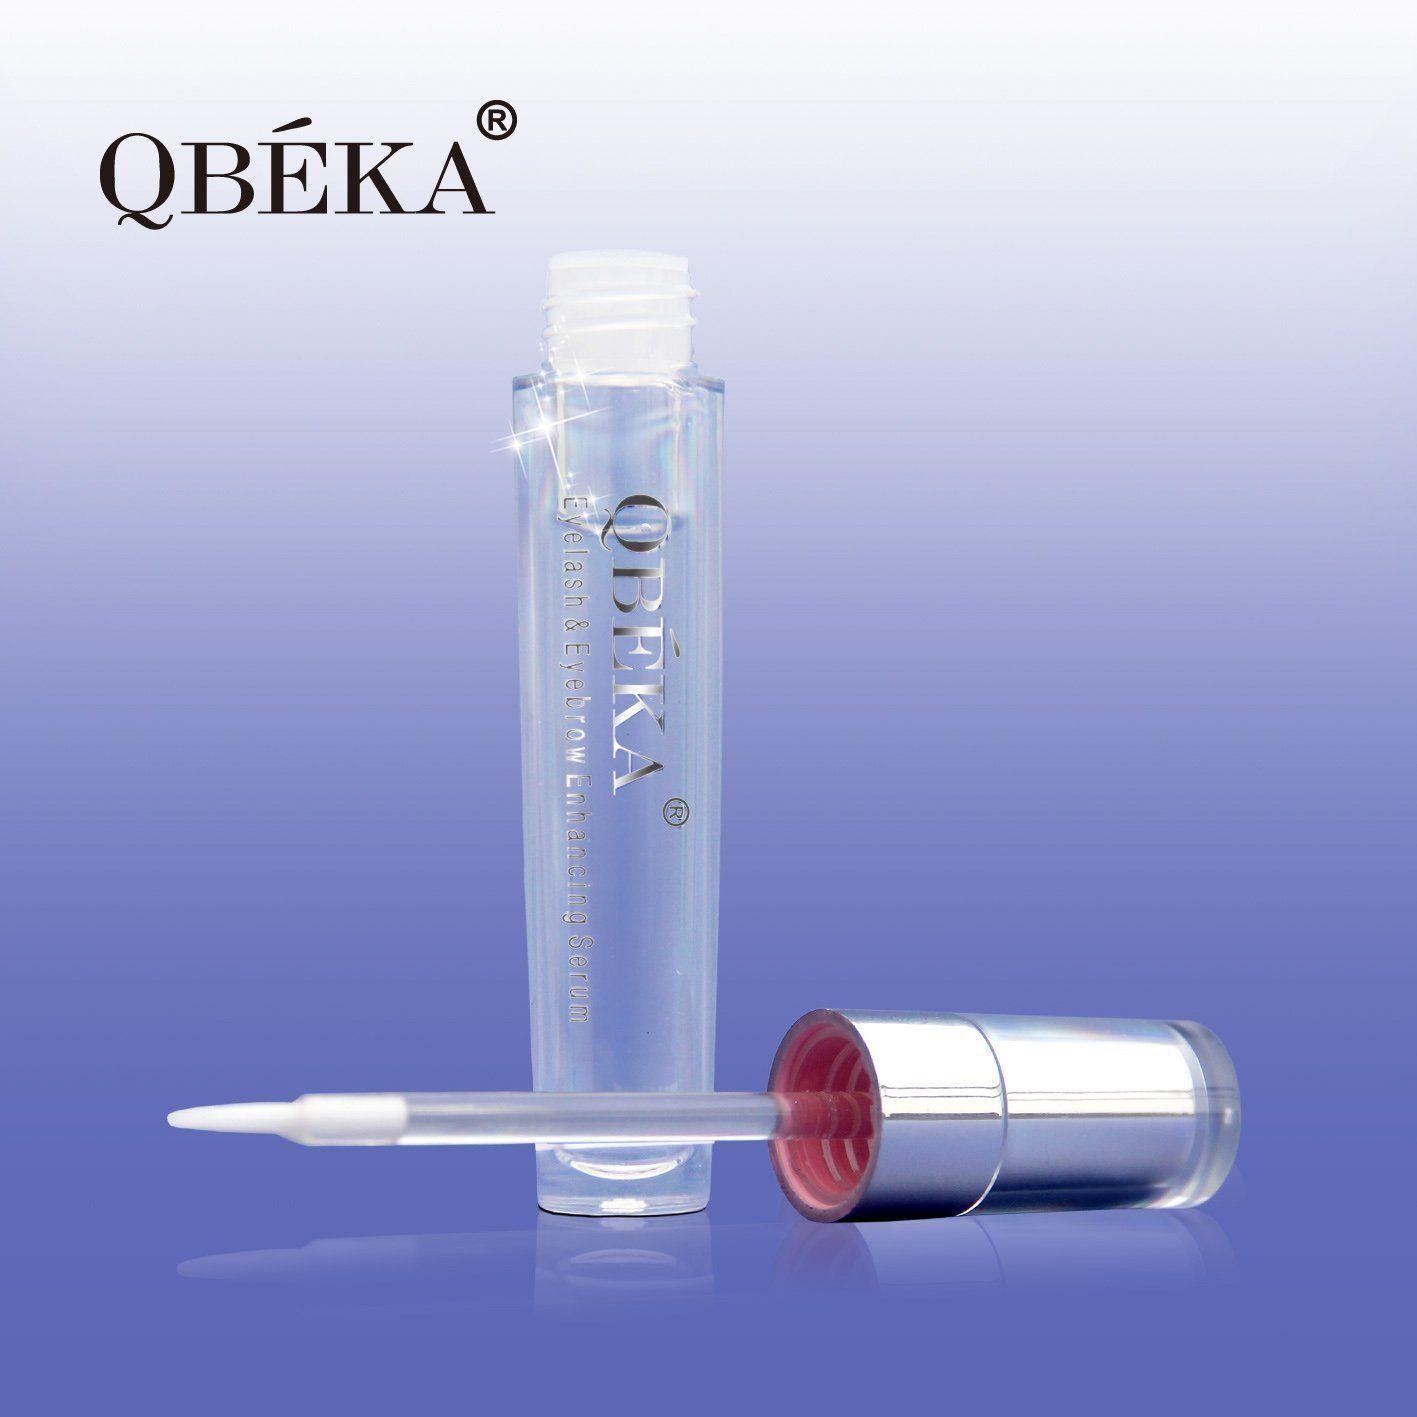 Eyelash Growth Products Qbeka Eyelash Eyebrow Enhancing Serum For